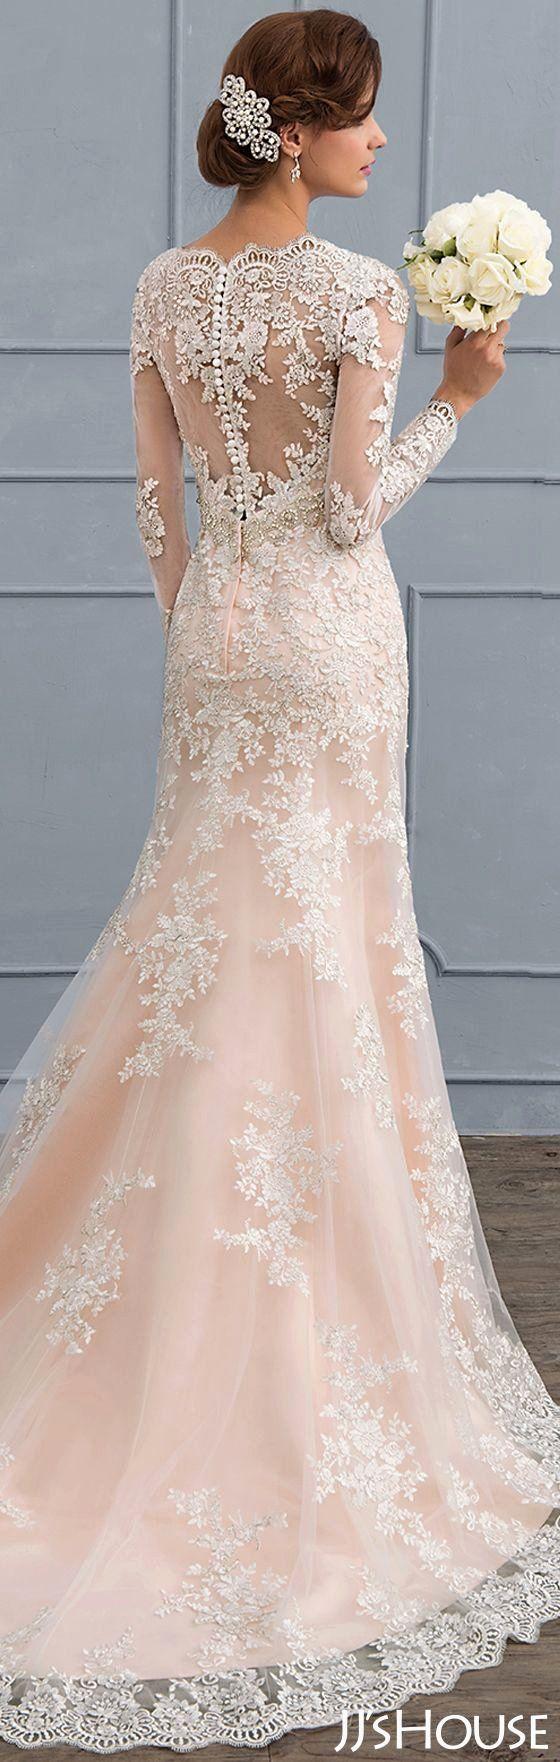 Jjs House Wedding Dress Inspirational A Perfect Dress For Your Wedding Jjshouse Wedding Lace Wedding Dress Vintage Ball Gowns Wedding Wedding Dresses Lace